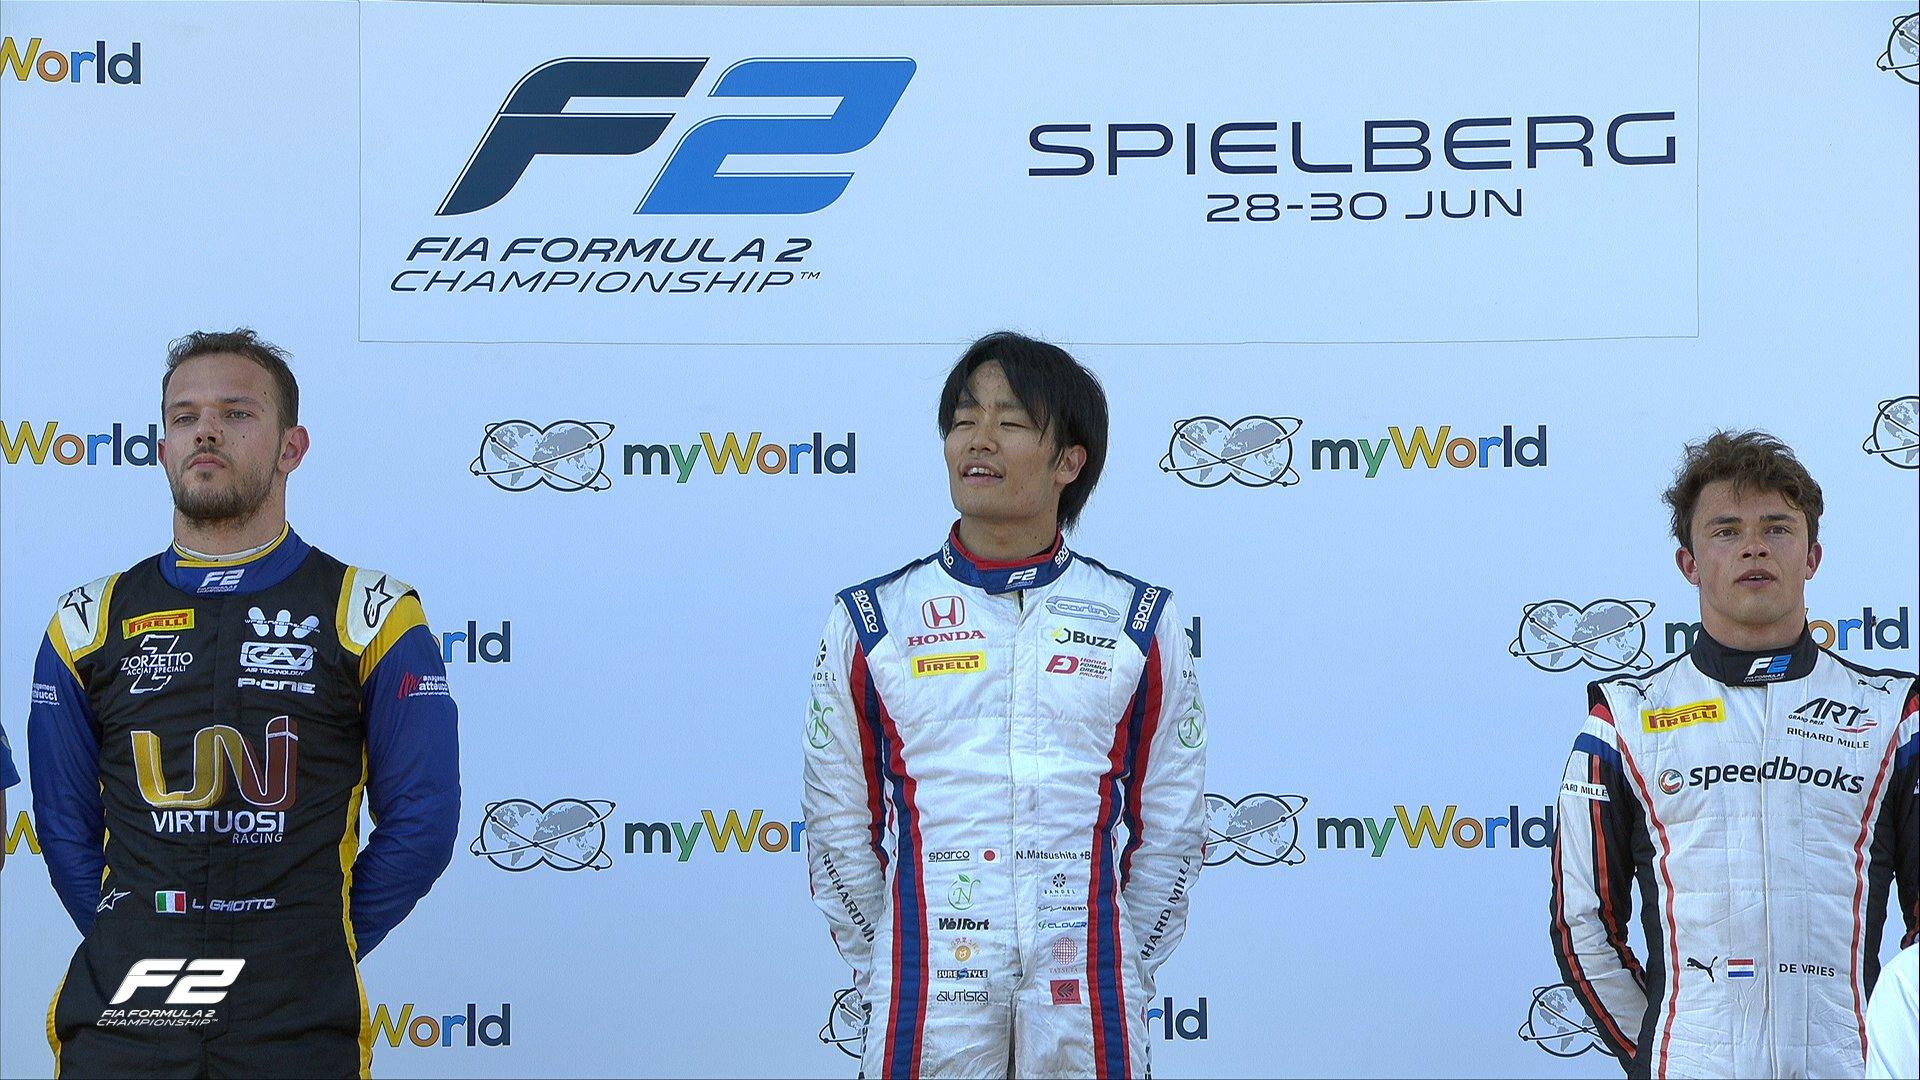 Formula 2 – Luca Ghiotto 2th